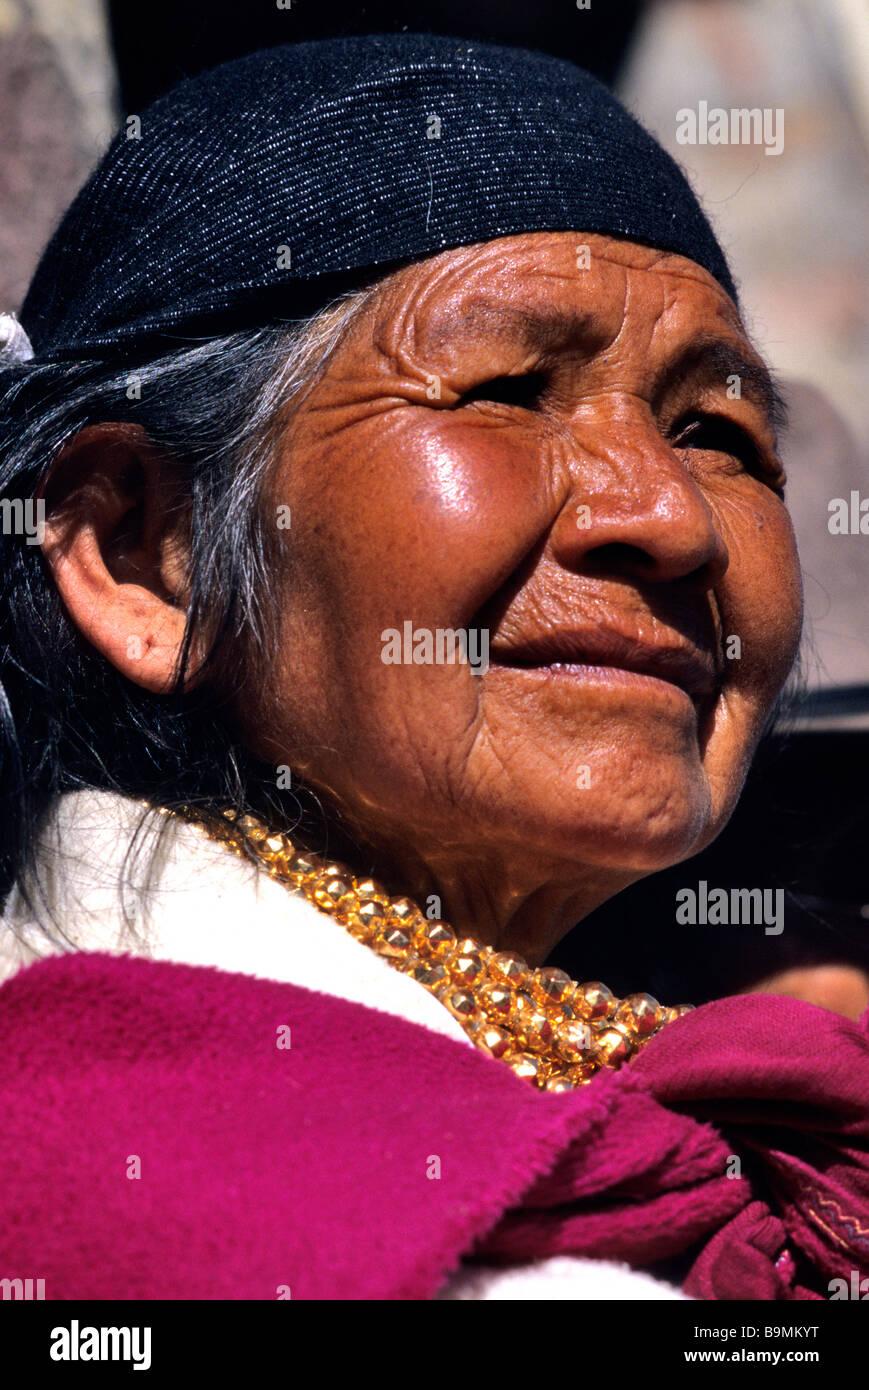 Ecuador, Imbabura province, Cotacachi, portrait of an Otavalo Indian woman Stock Photo